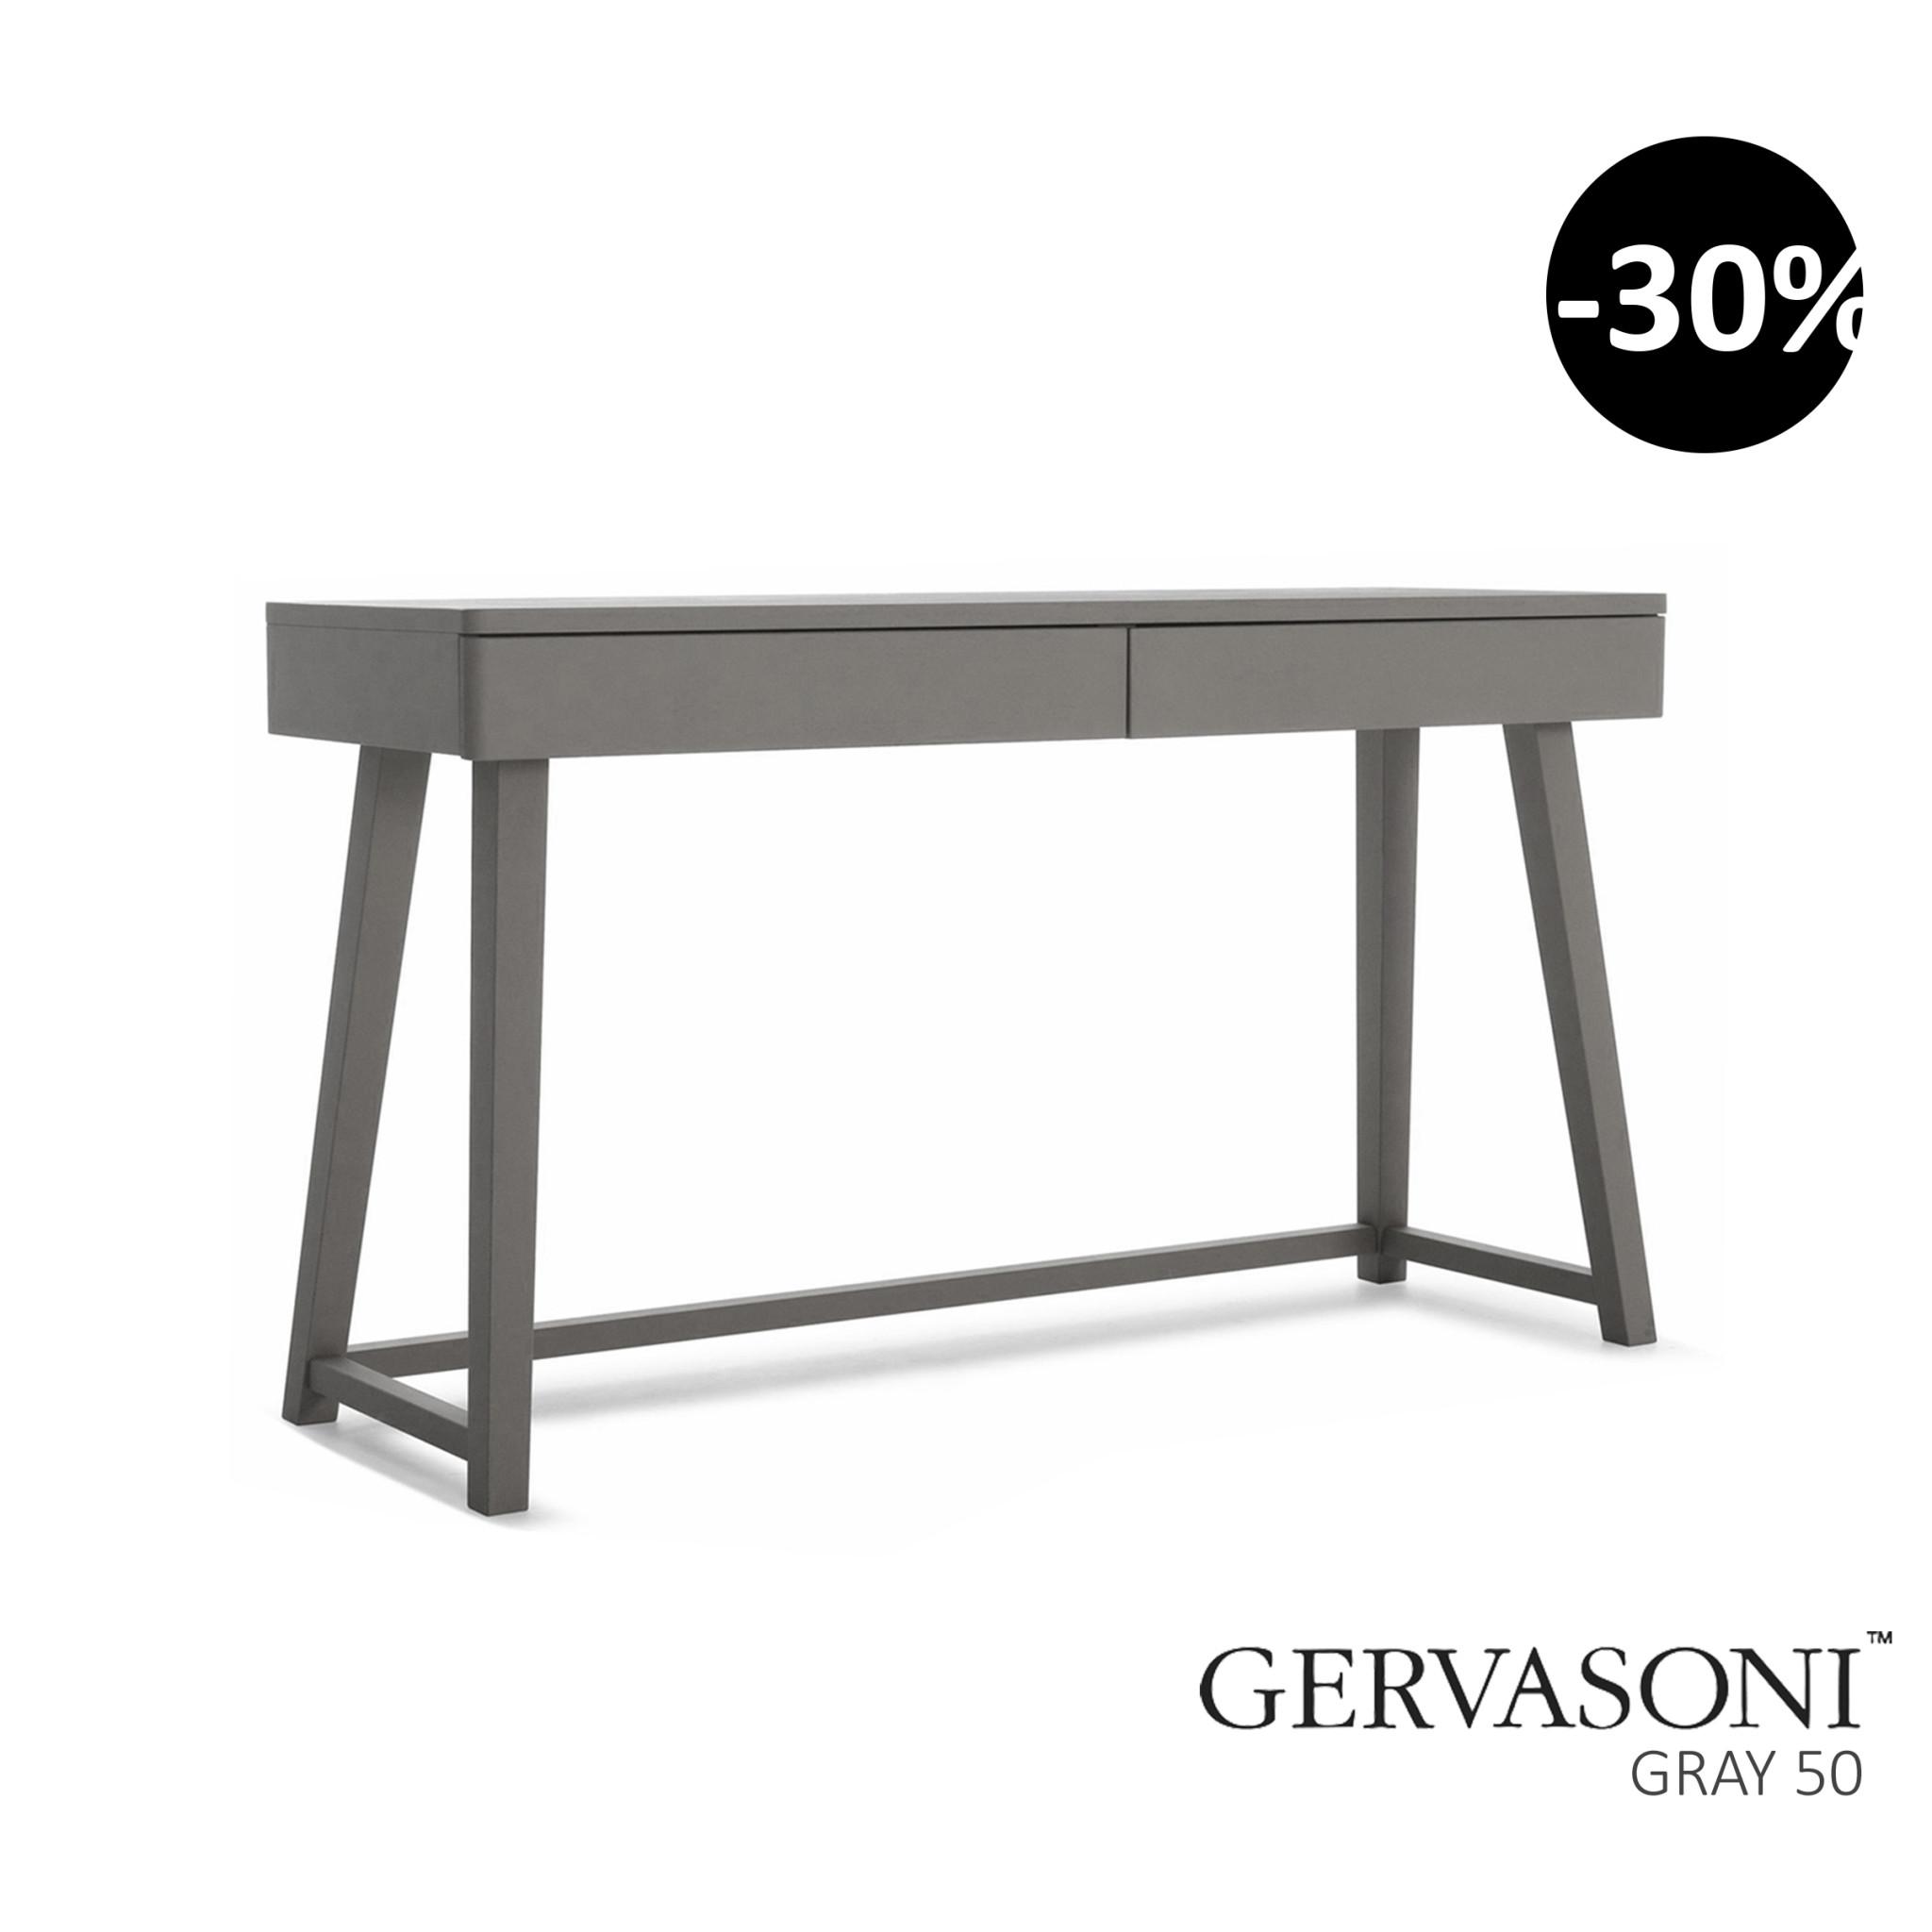 GERVASONI Gray 50